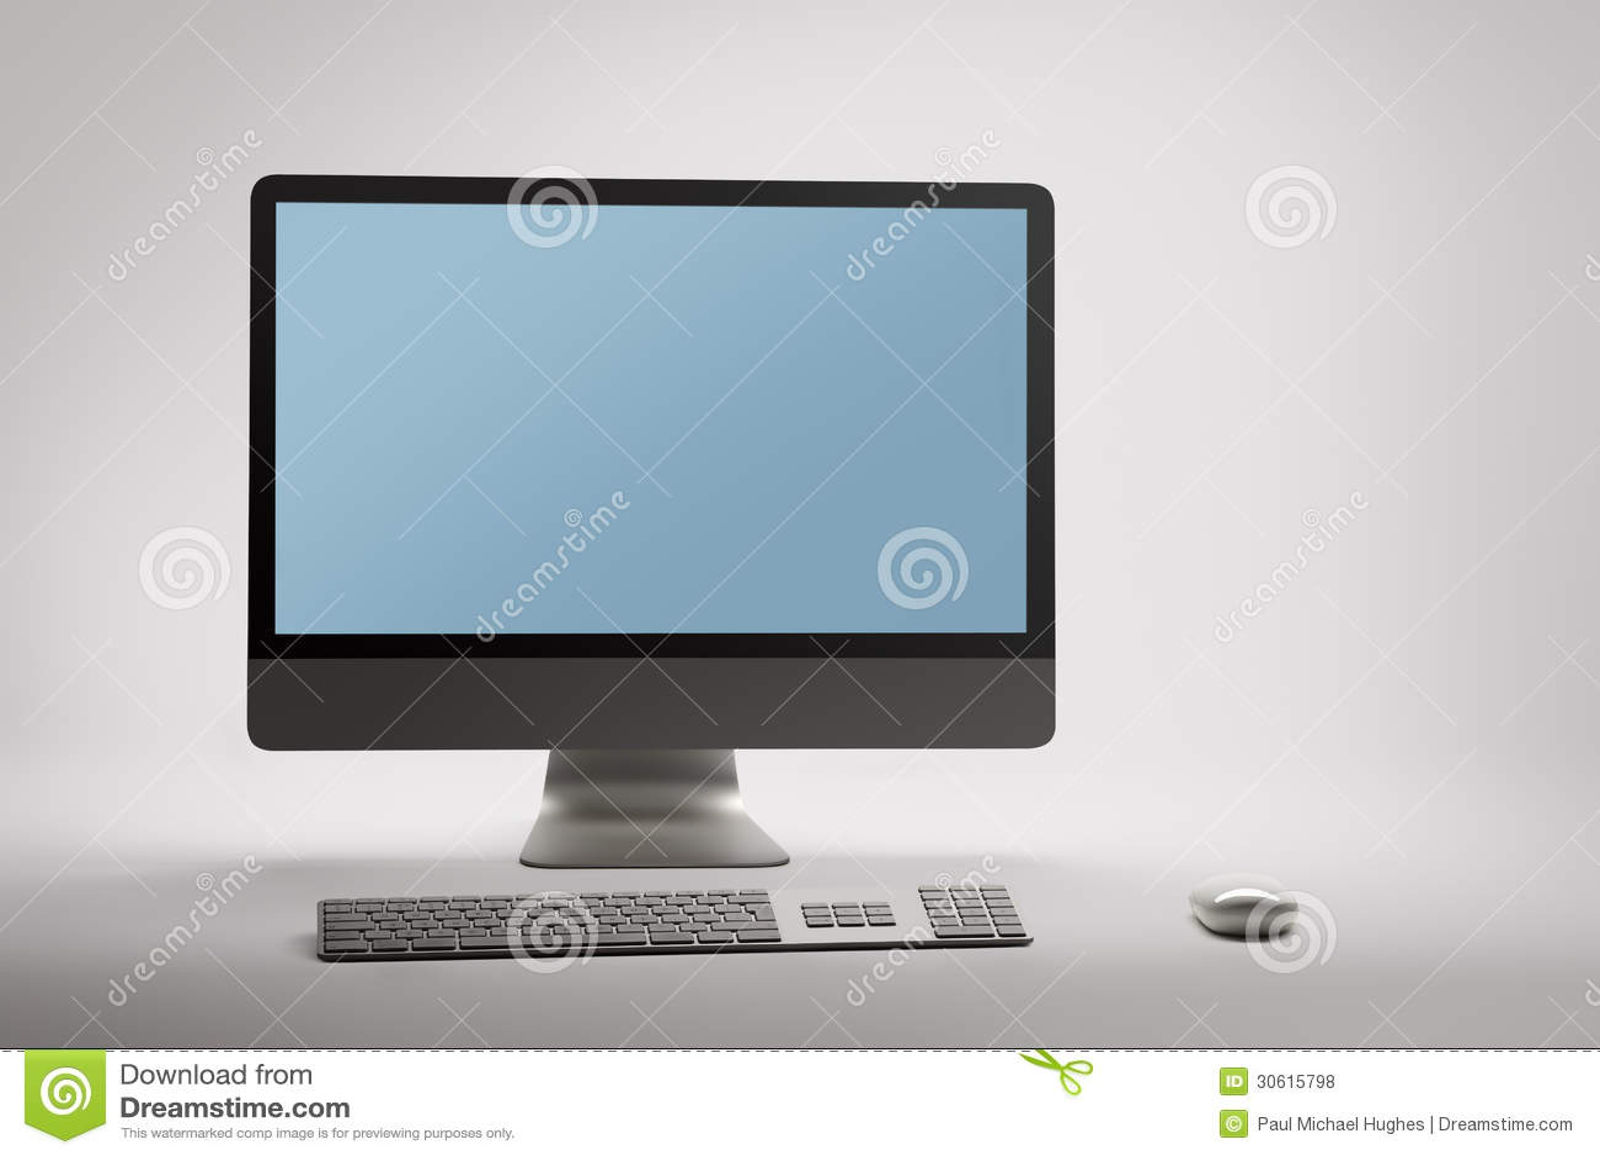 Komputer stacjonarny z pustym pustym ekranem